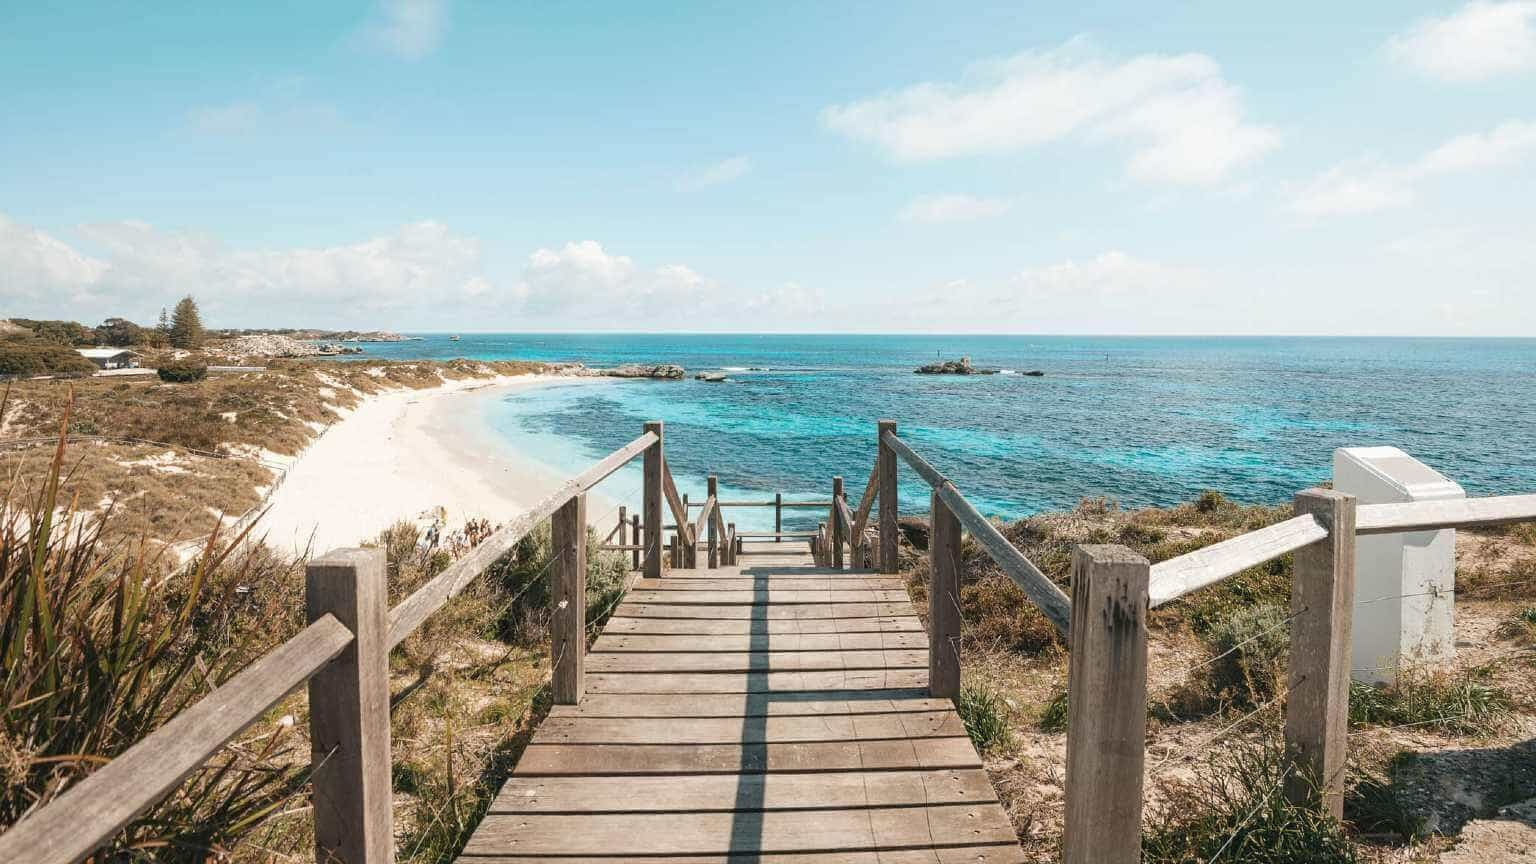 Rottnest Island beaches and walkways near Perth, Australia